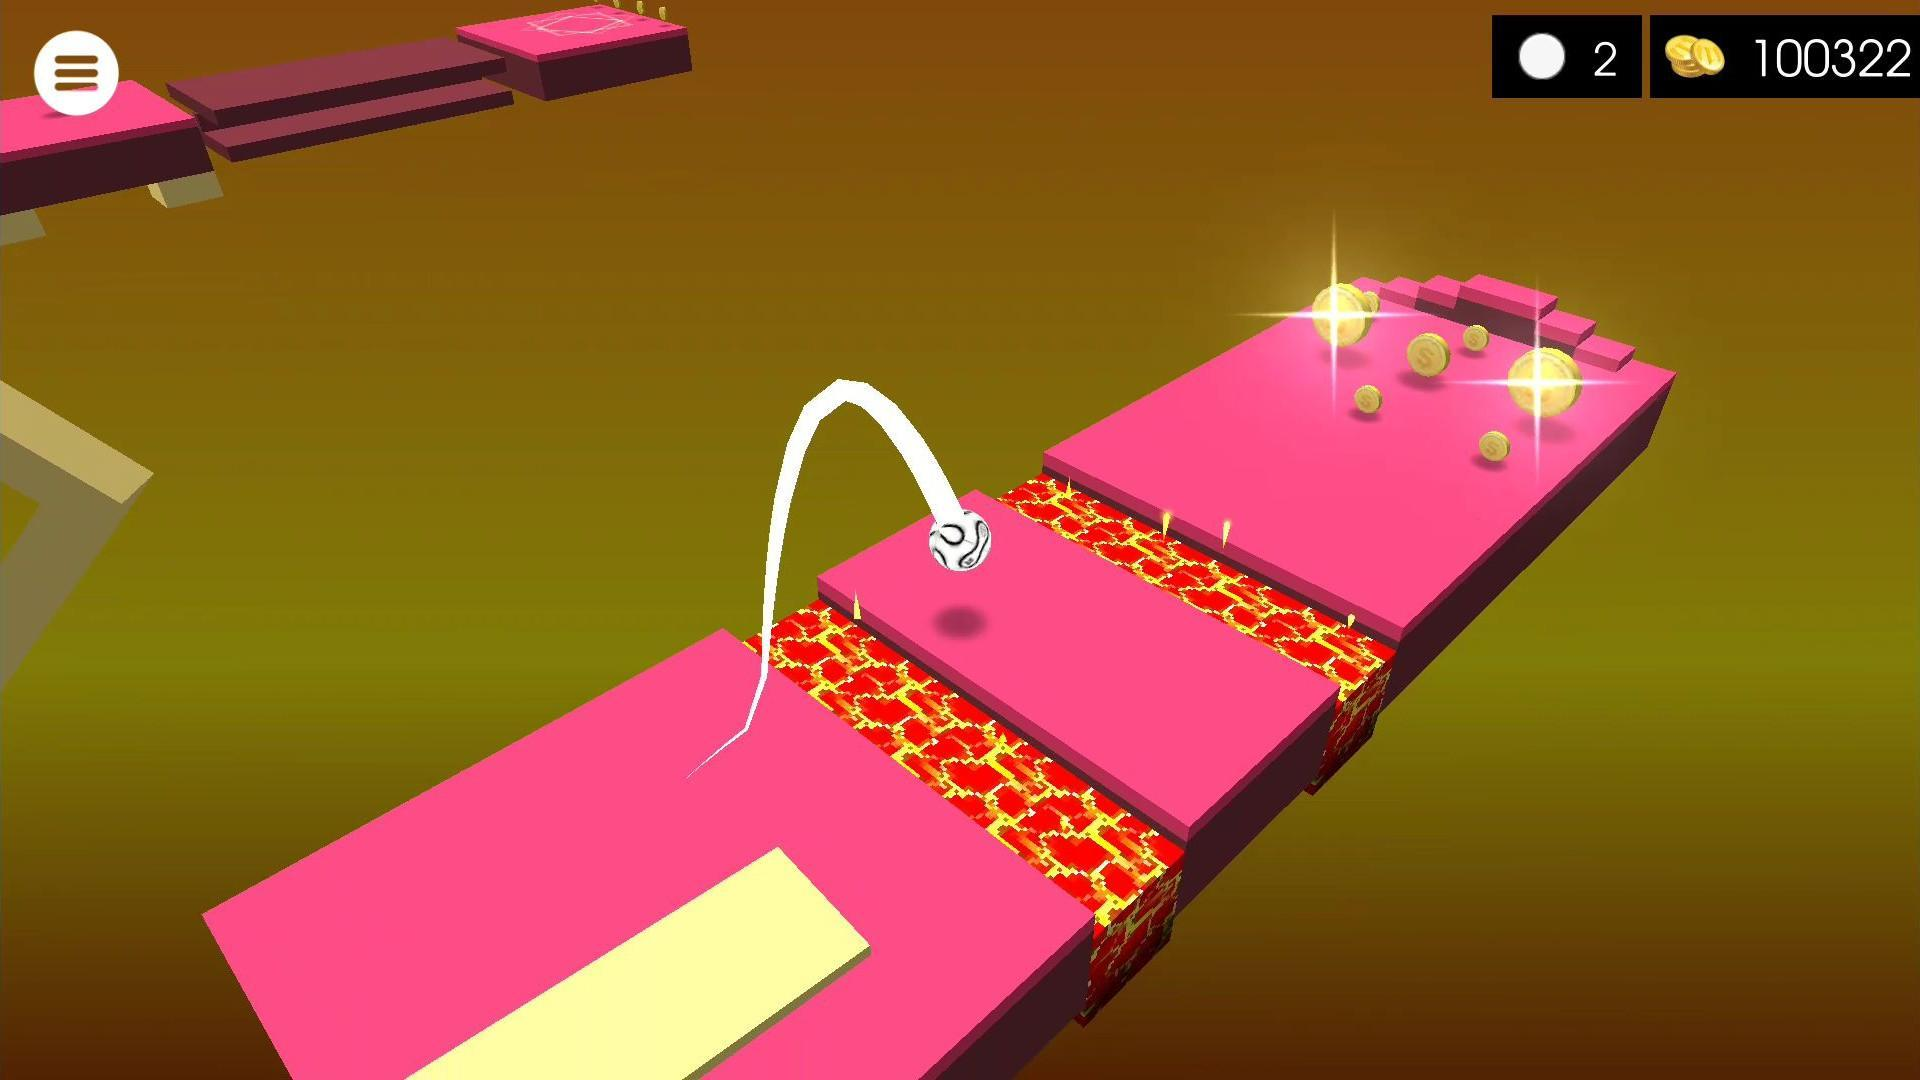 RYWO free 3D roll ball game 1.2.3 Screenshot 3